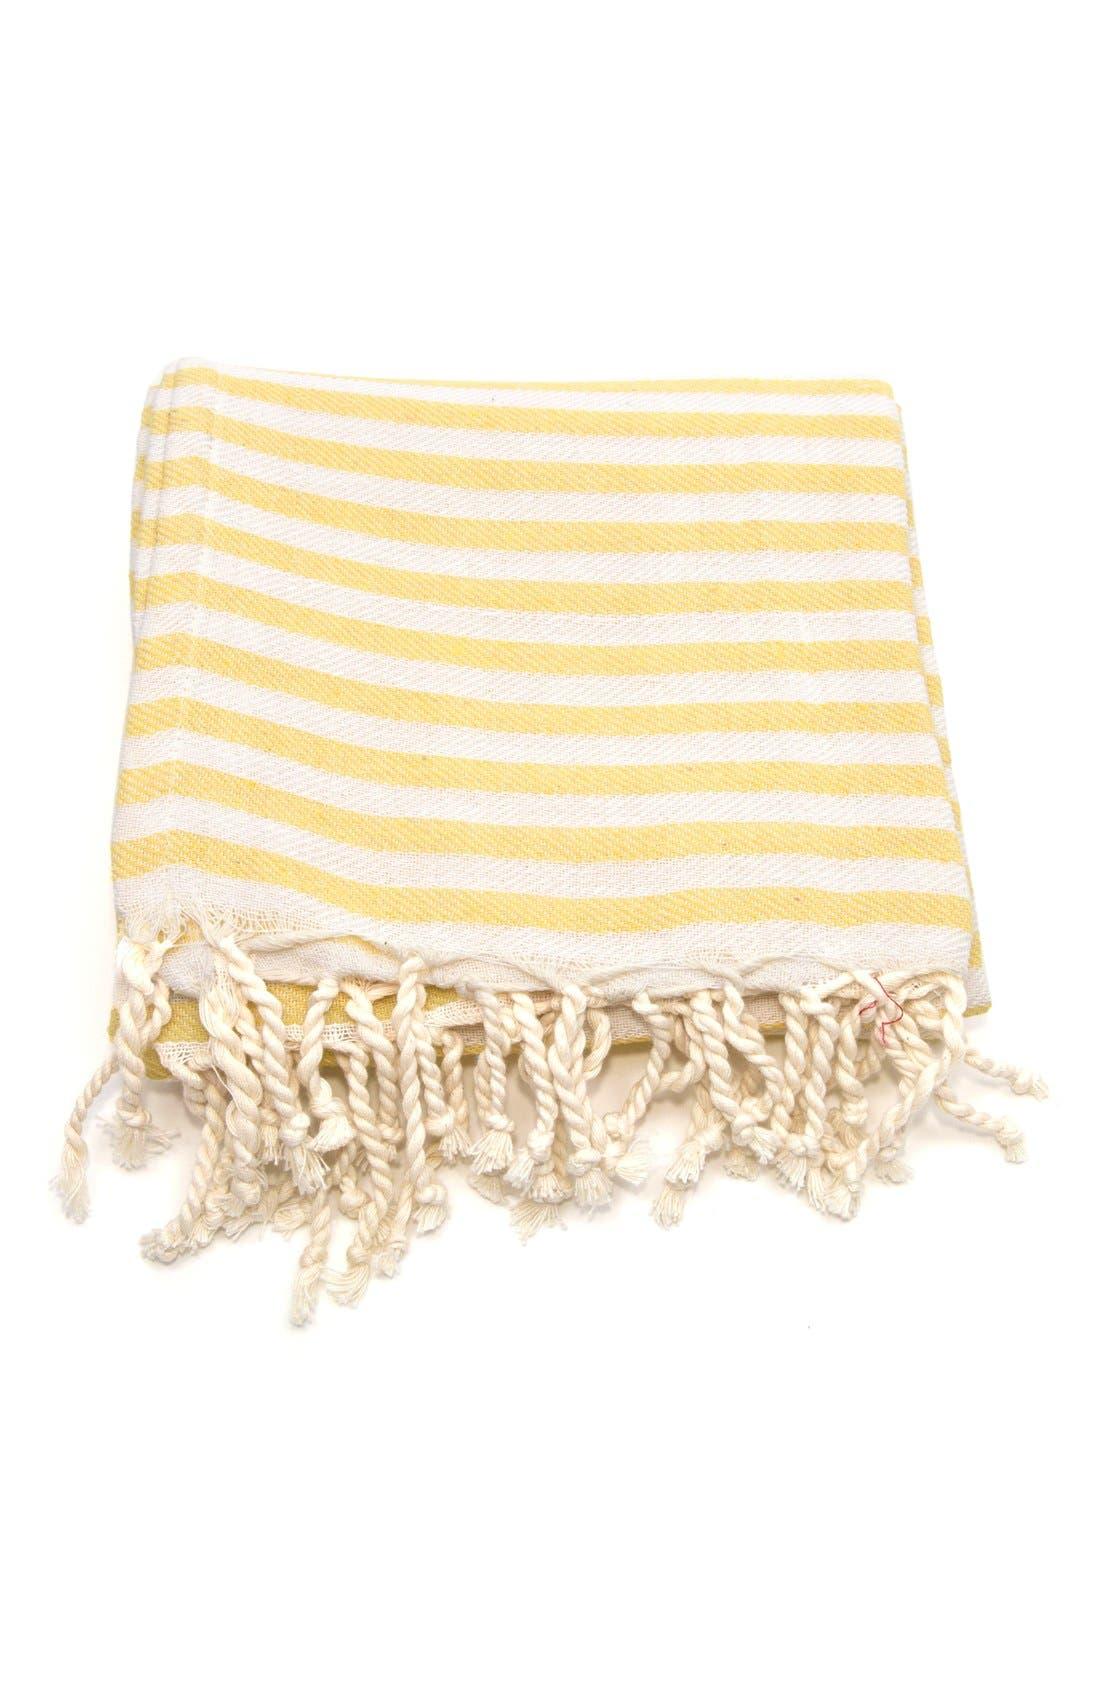 ,                             'Fun in the Sun' Turkish Pestemal Towel,                             Alternate thumbnail 25, color,                             700